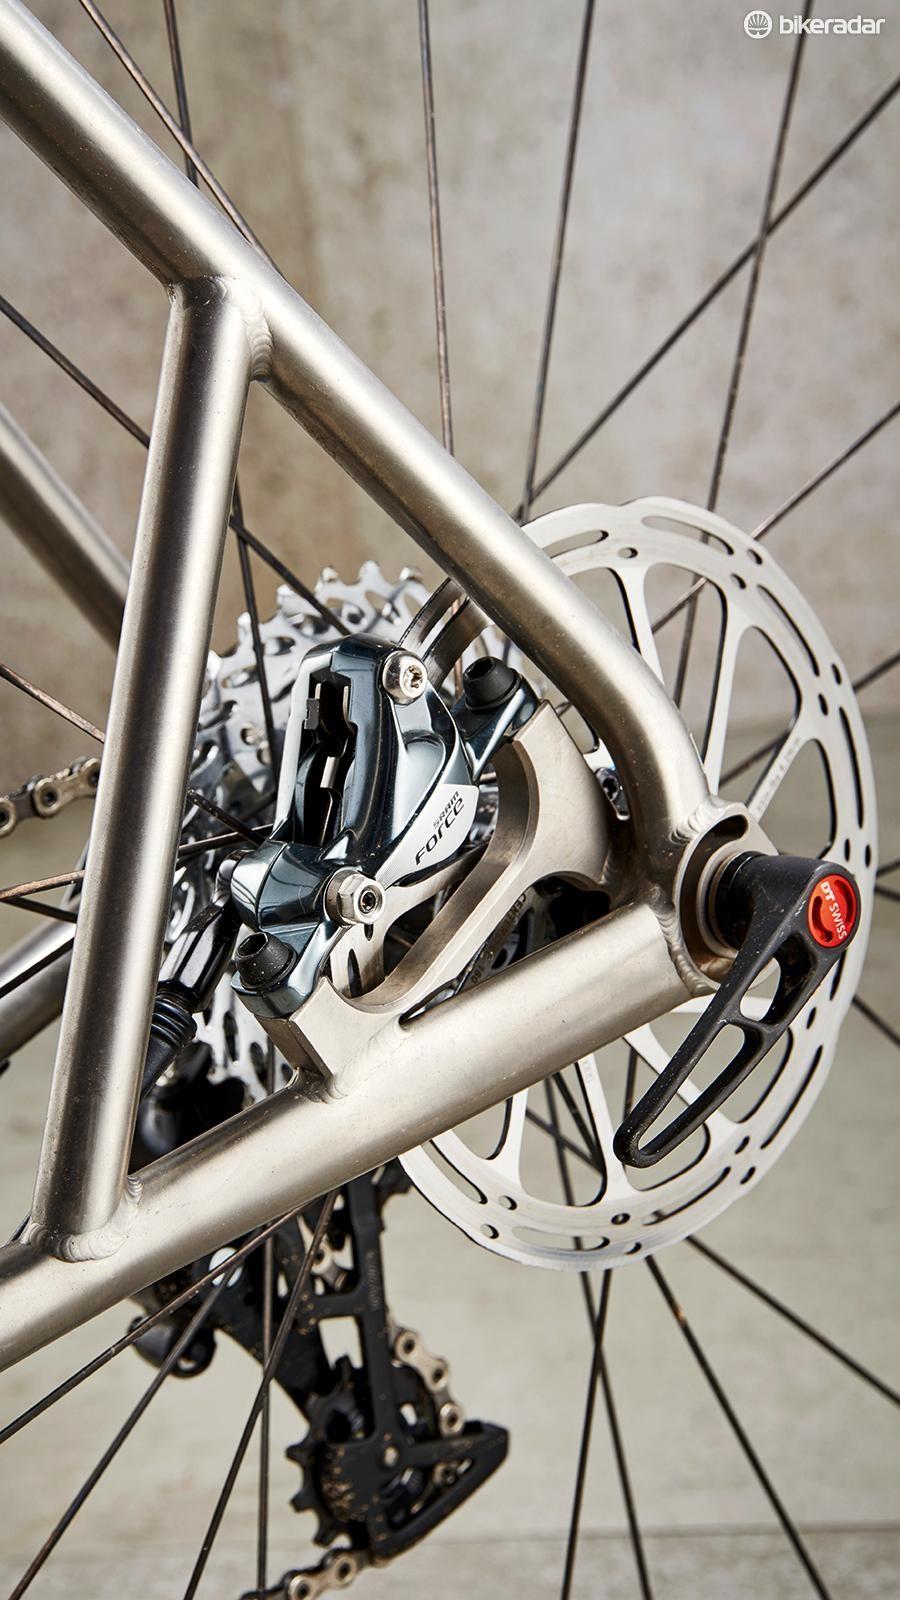 Litespeed T5 Gravel custom build - BikeRadar